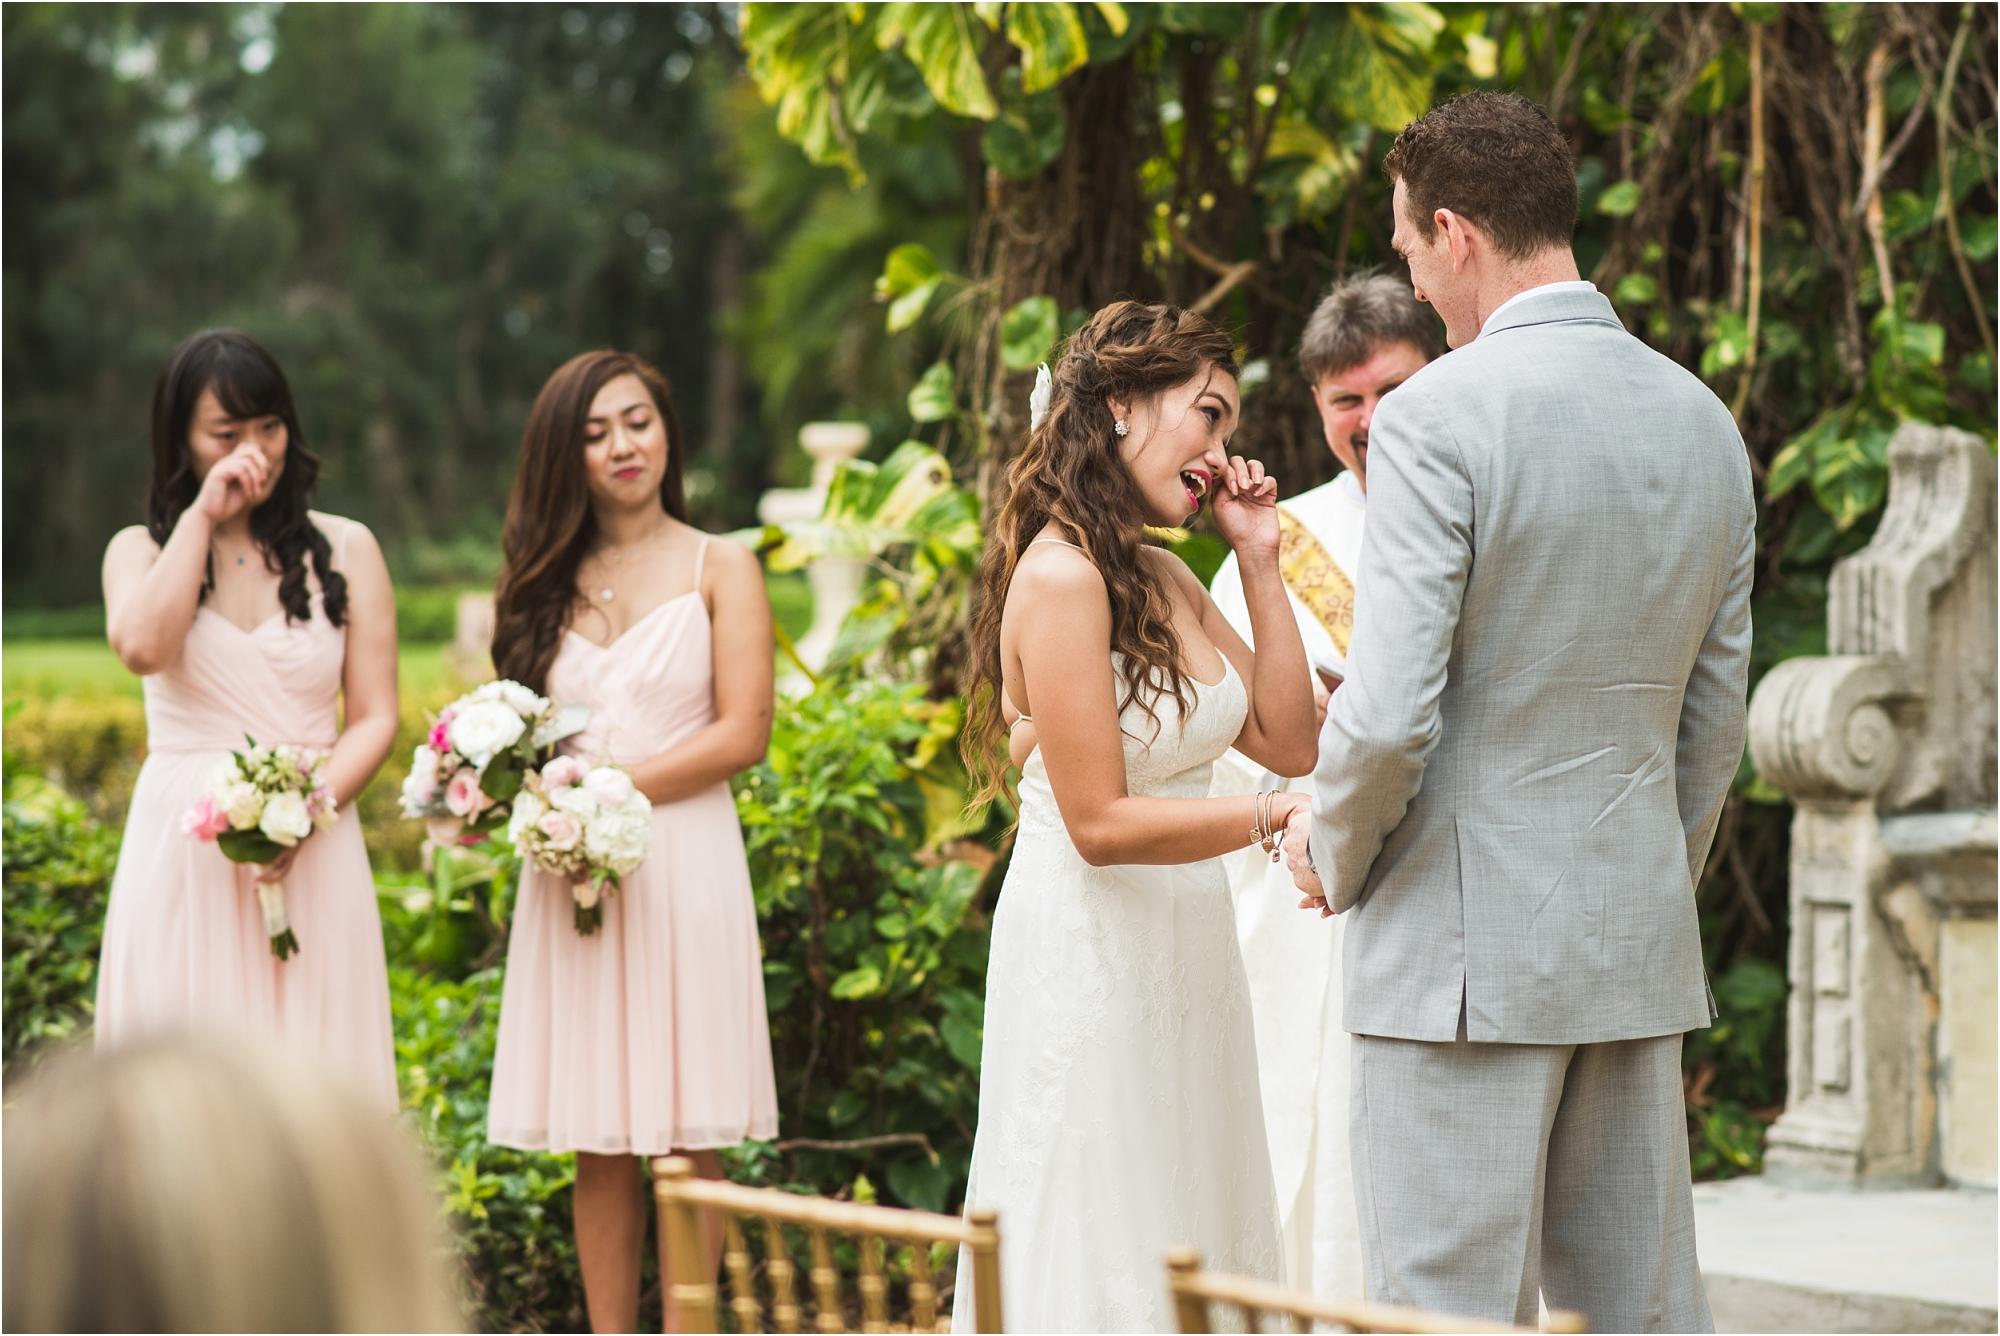 Spanish-Monastery-miami-beach-outdoor-elegant-wedding-photographer-jessenia-gonzalez_1167.jpg